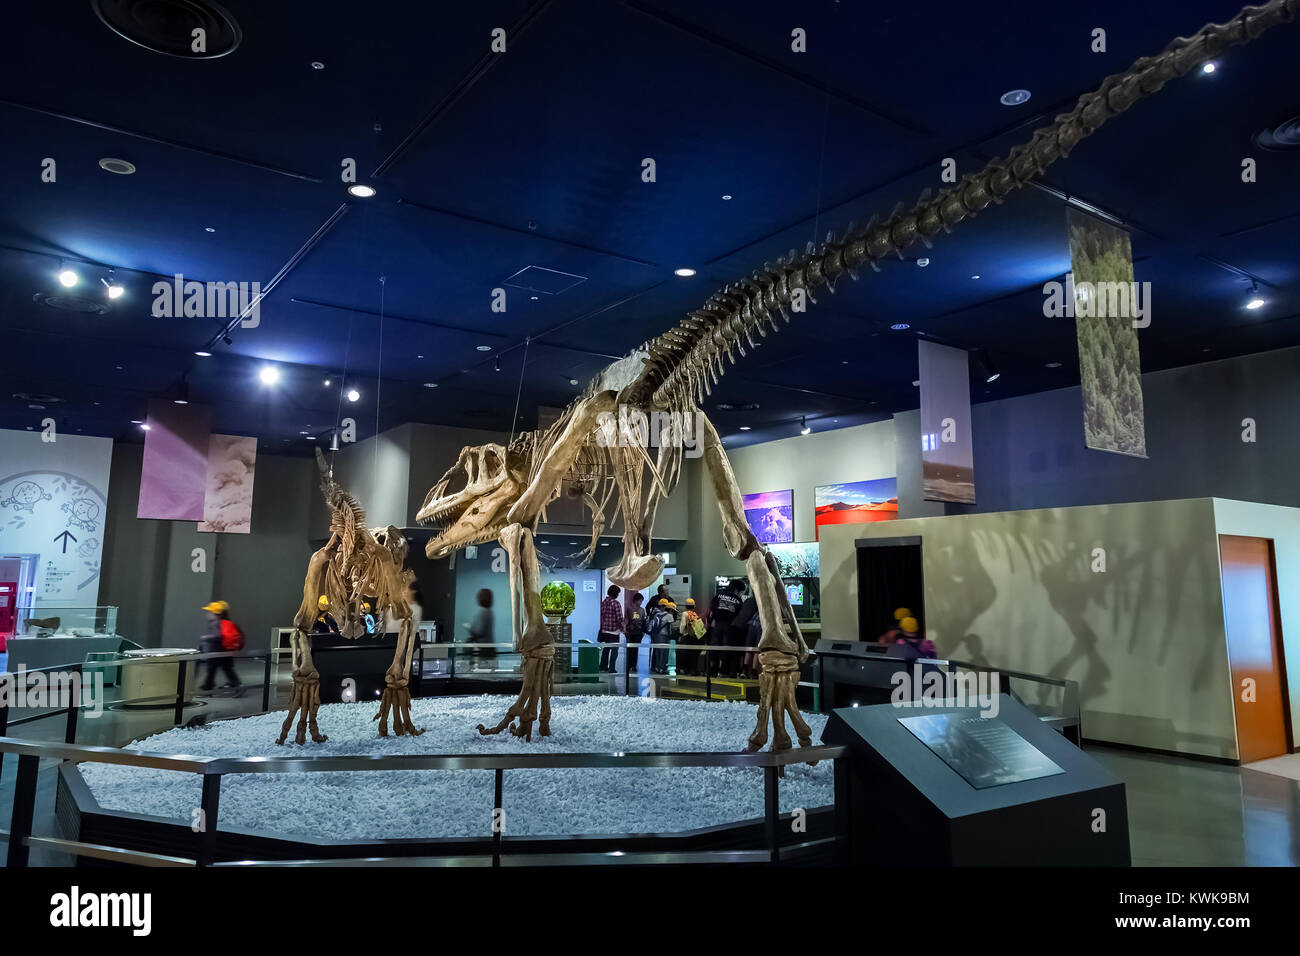 NAGOYA, JAPAN - NOVEMBER 18, 2015: Dinosaur skeletons displayed at the first floor of Nagoya City Science Museum, Stock Photo